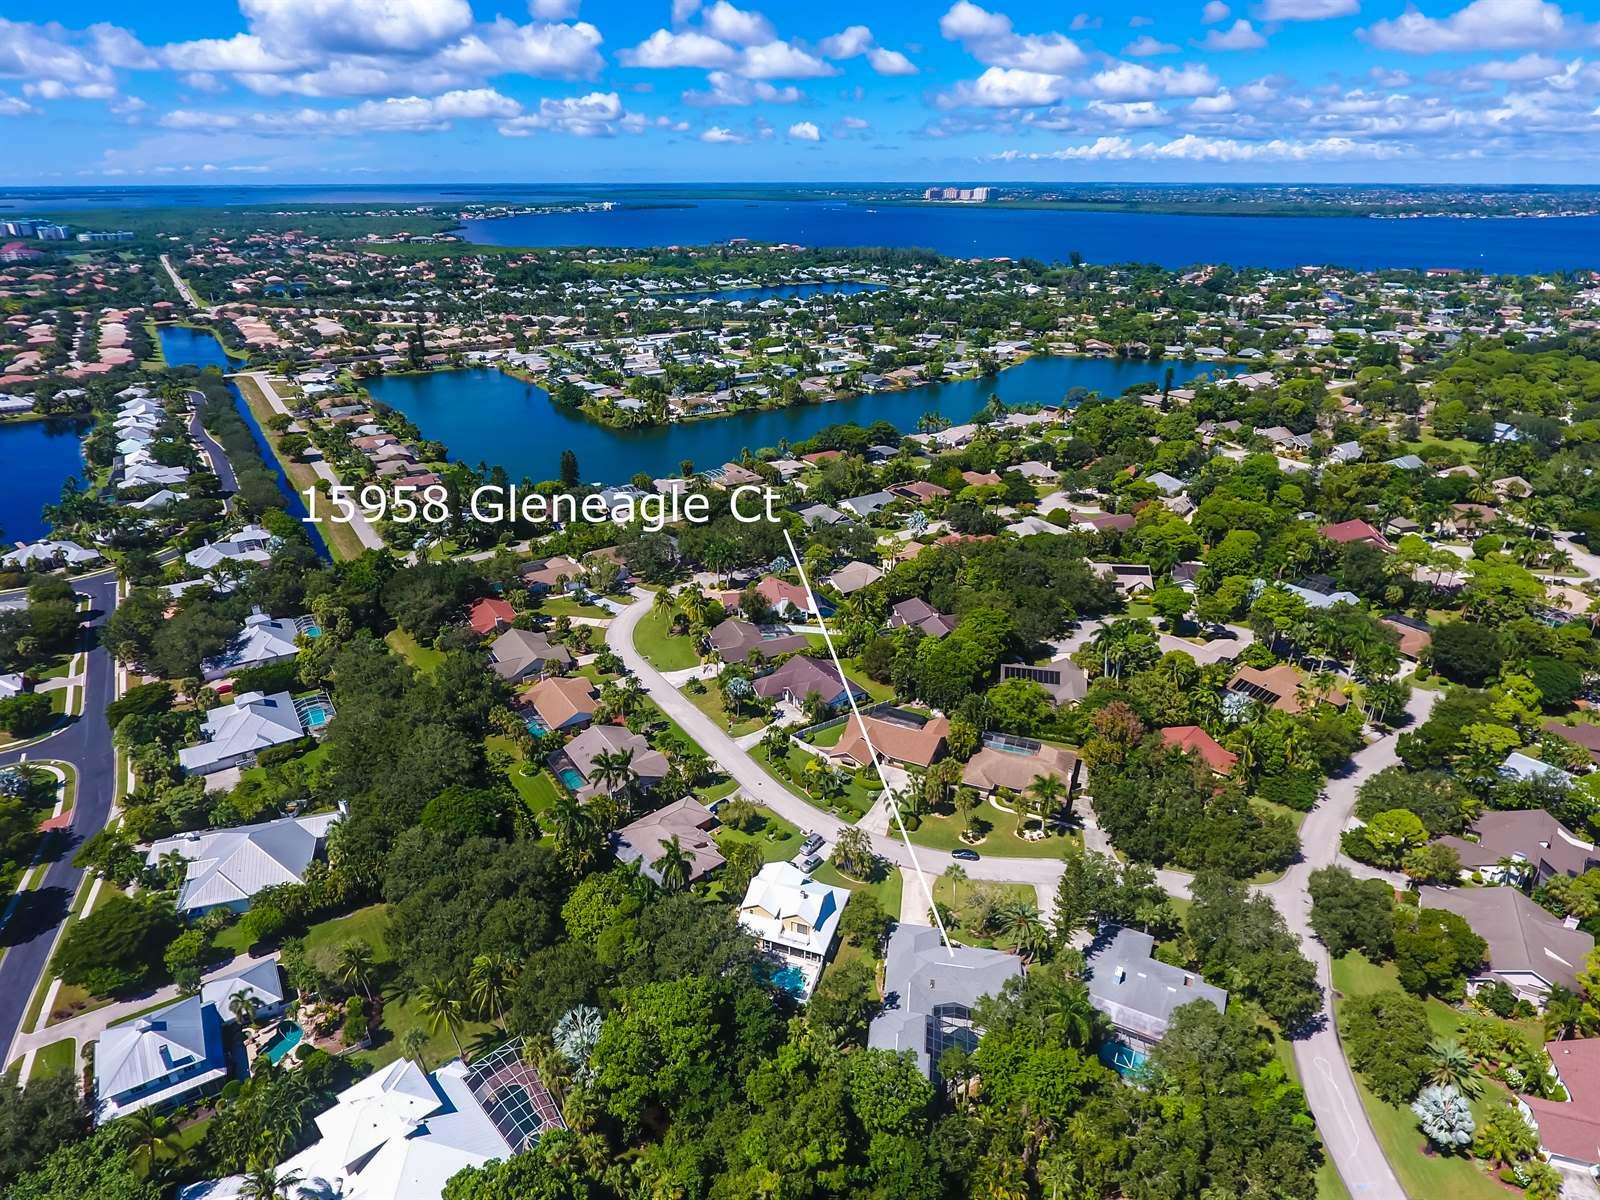 15958 Gleneagle Ct, Fort Myers, FL 33908